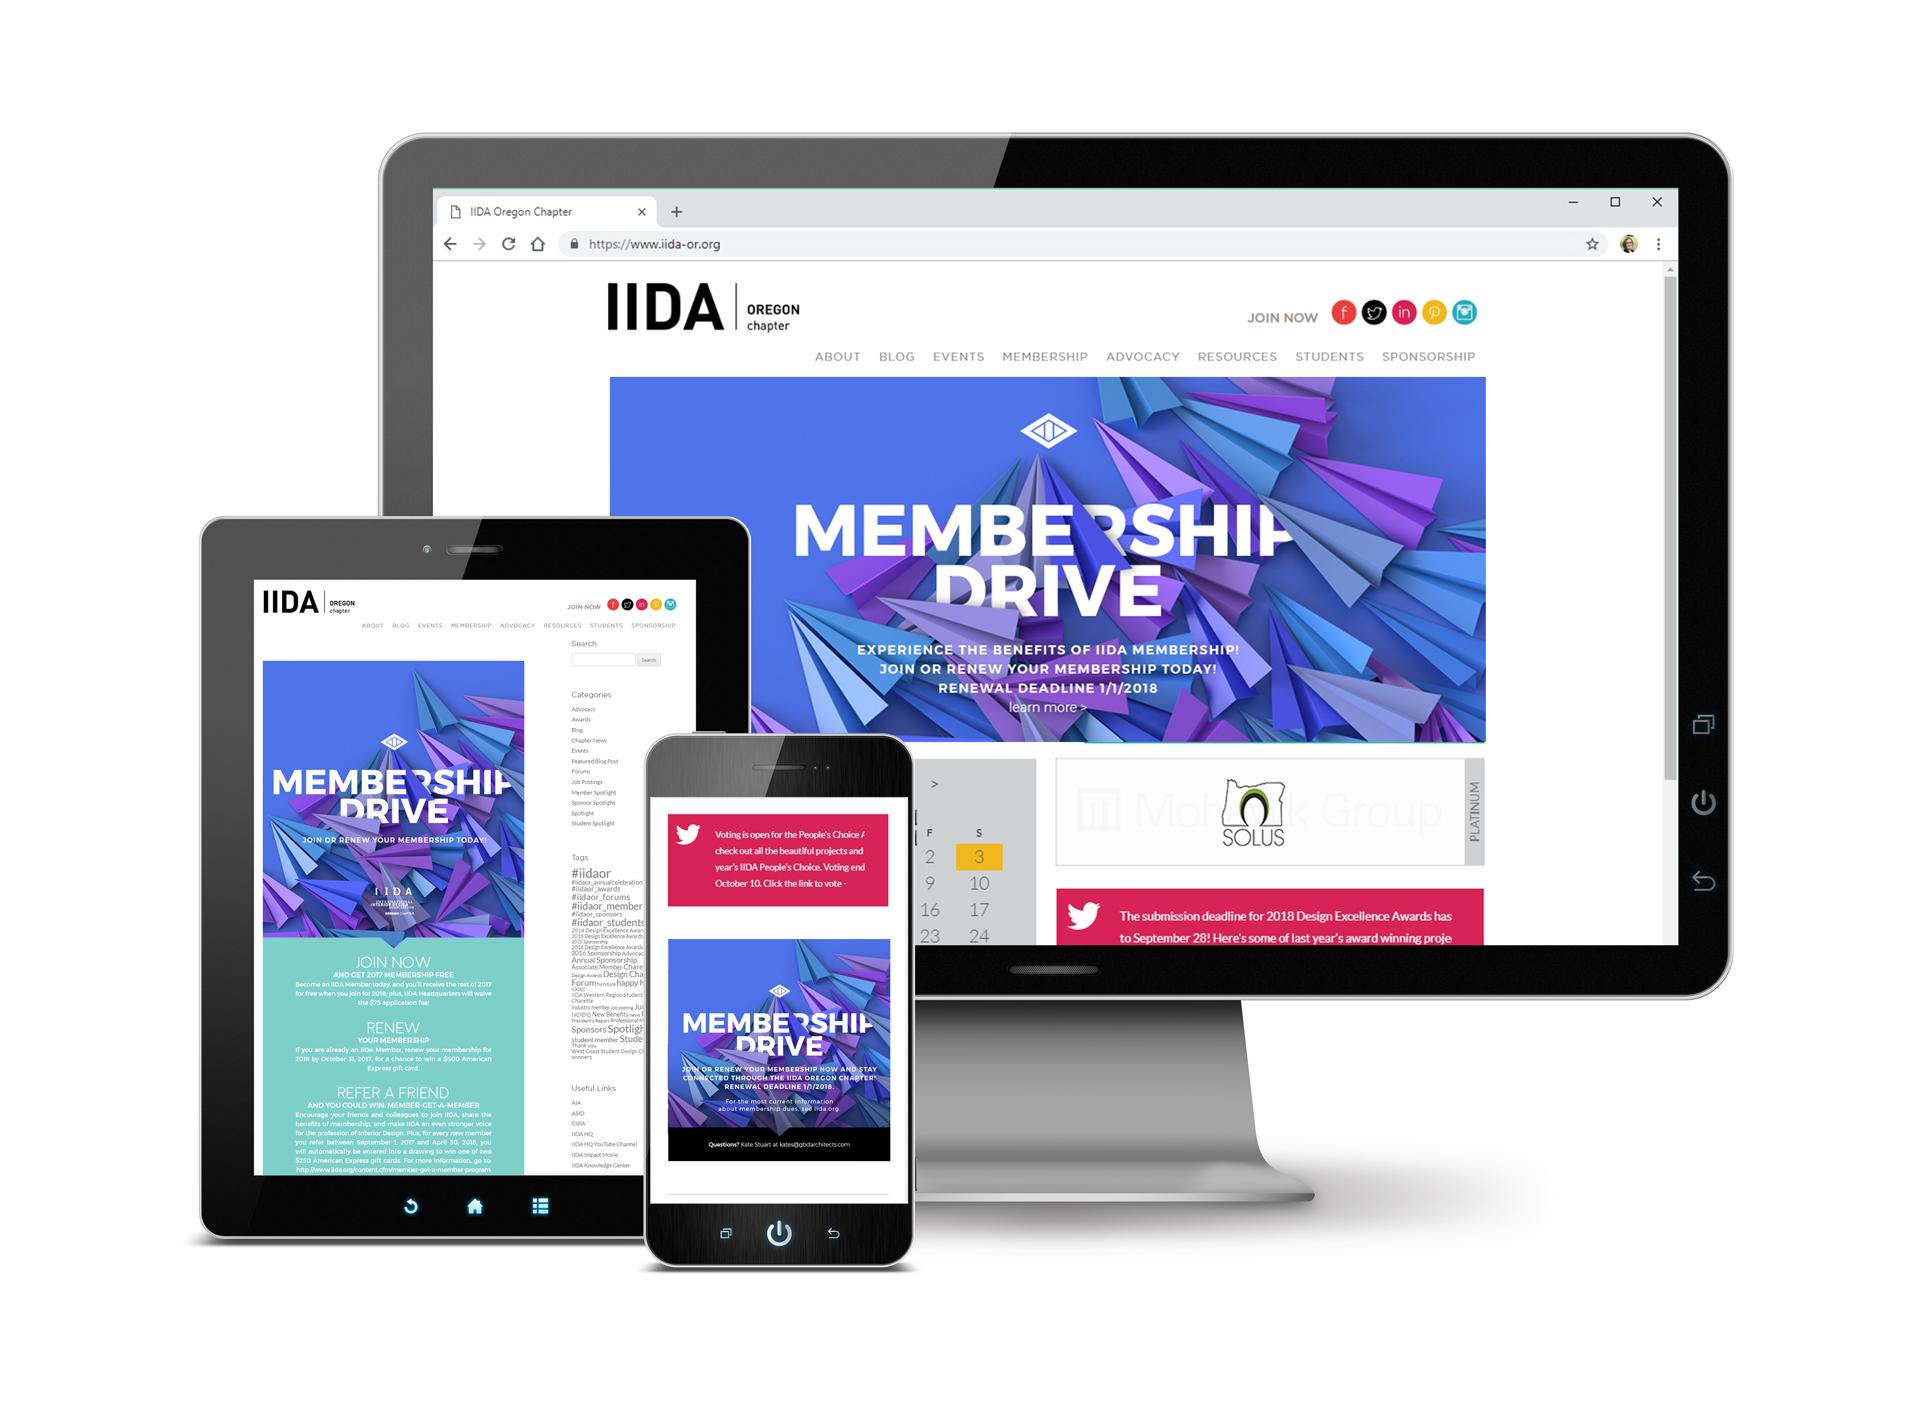 IIDAor_membership-drive.jpg